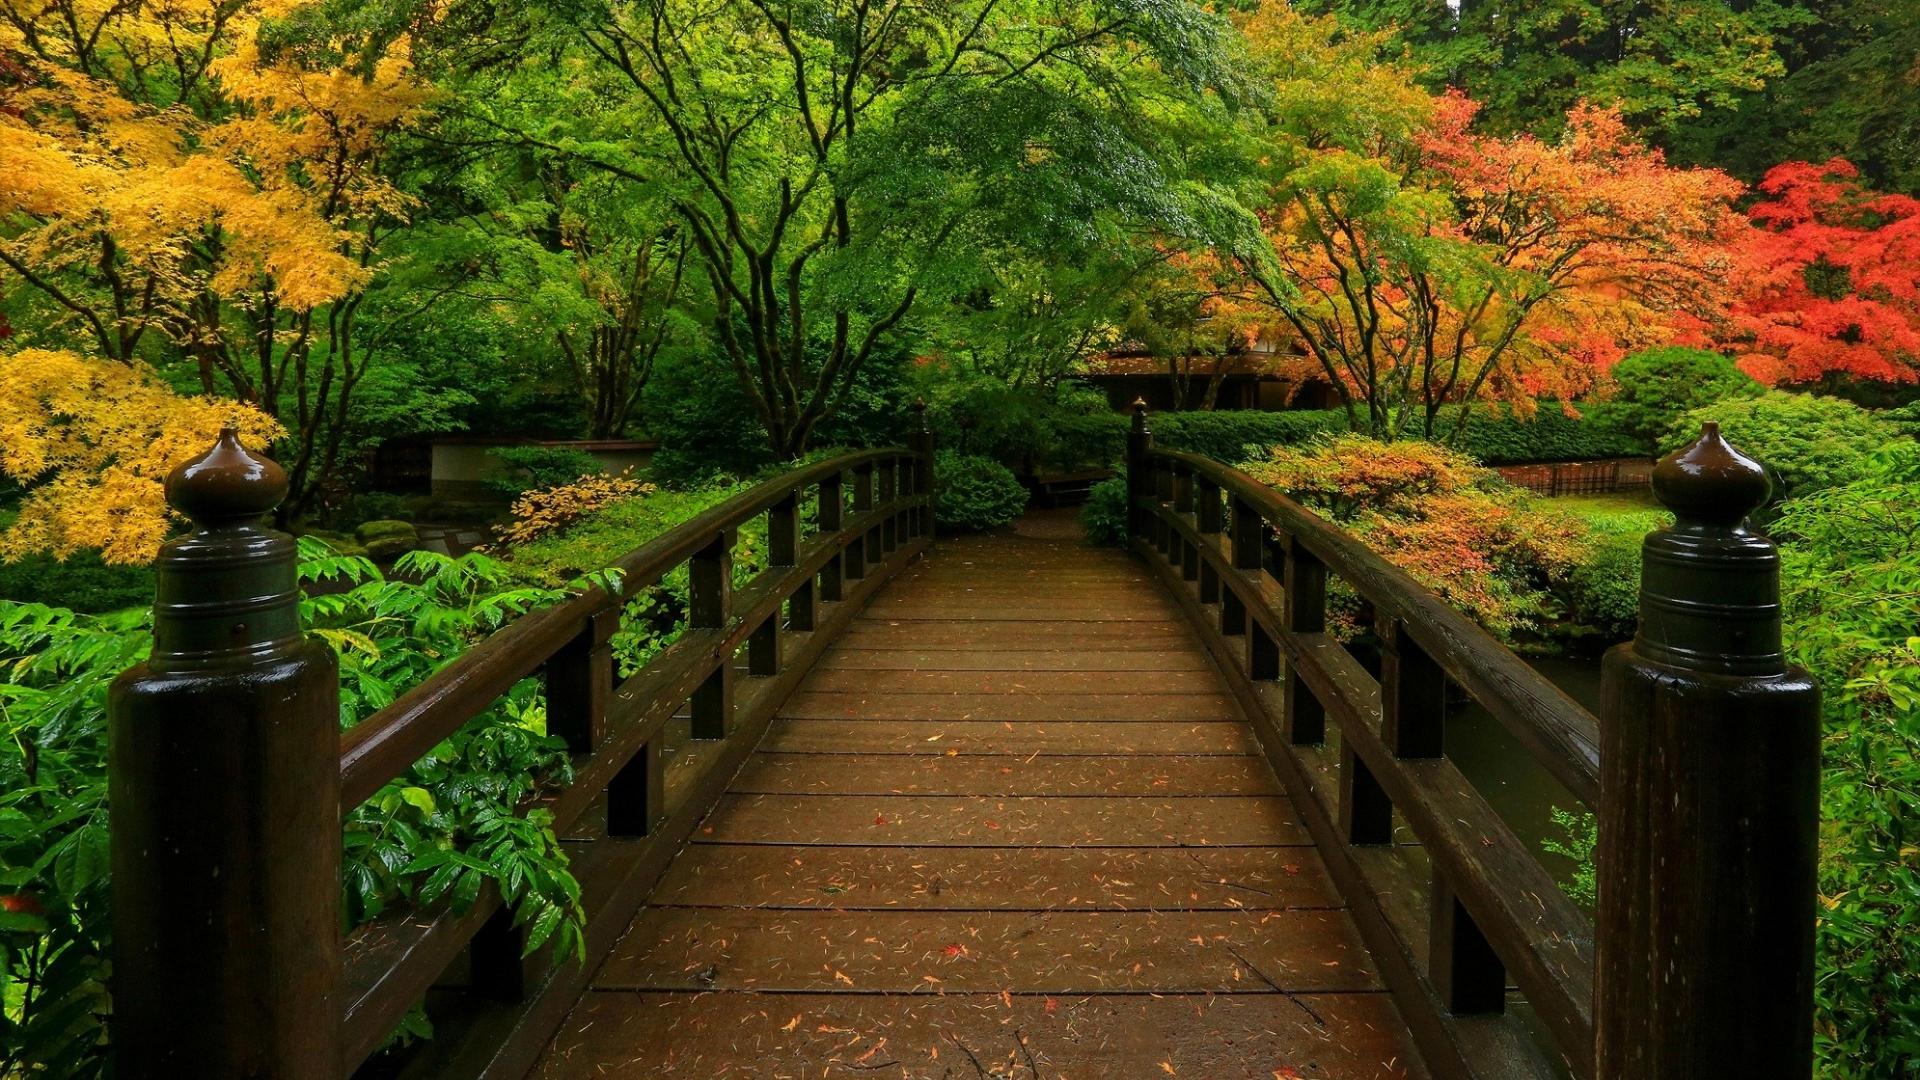 Fall Wallpaper Iphone 5 Bridge In Japanese Garden Hd Wallpaper Background Image